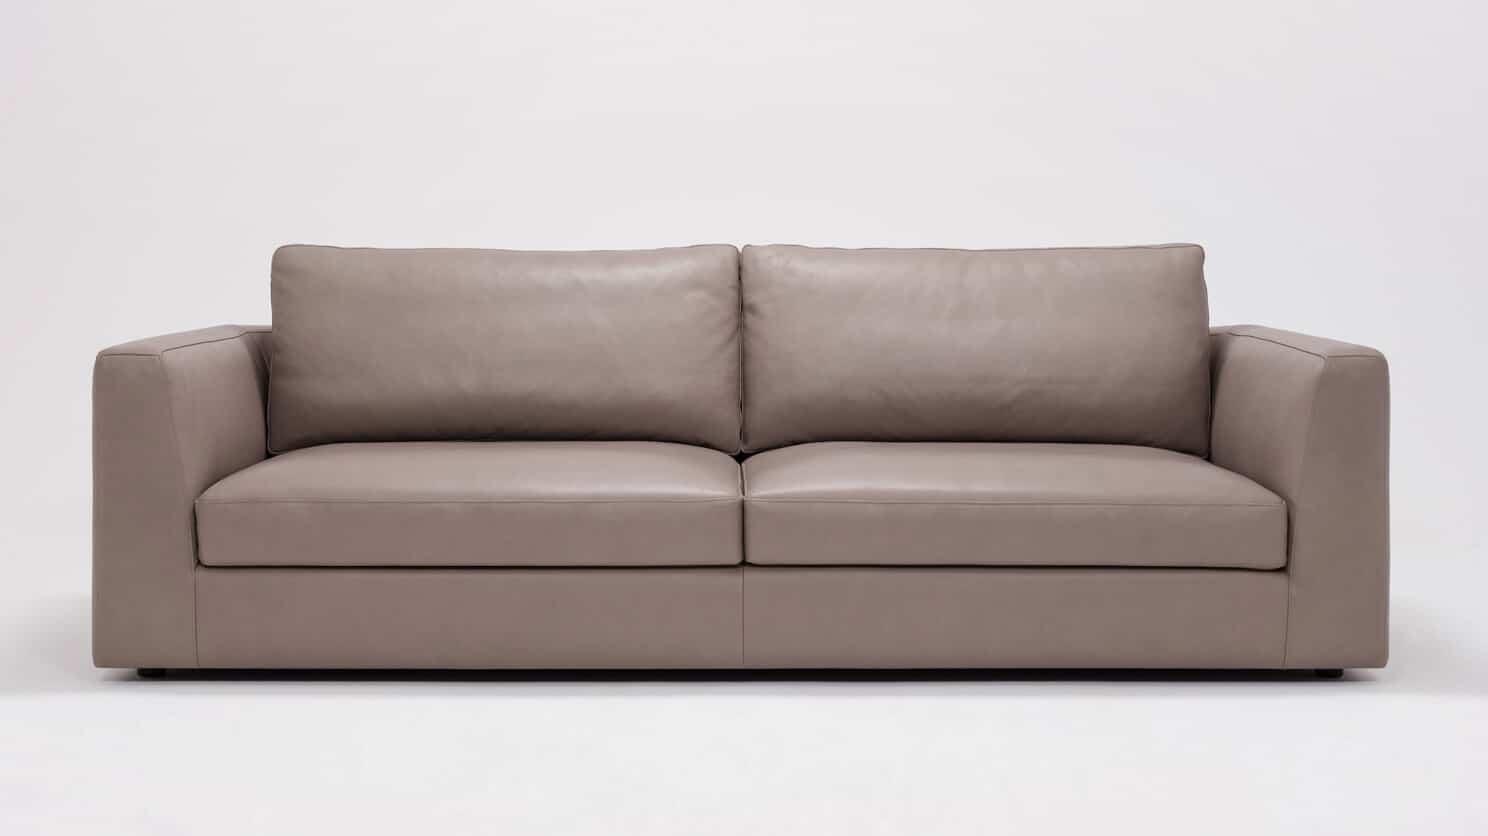 37136 01 01 sofa cello suave chrome front view